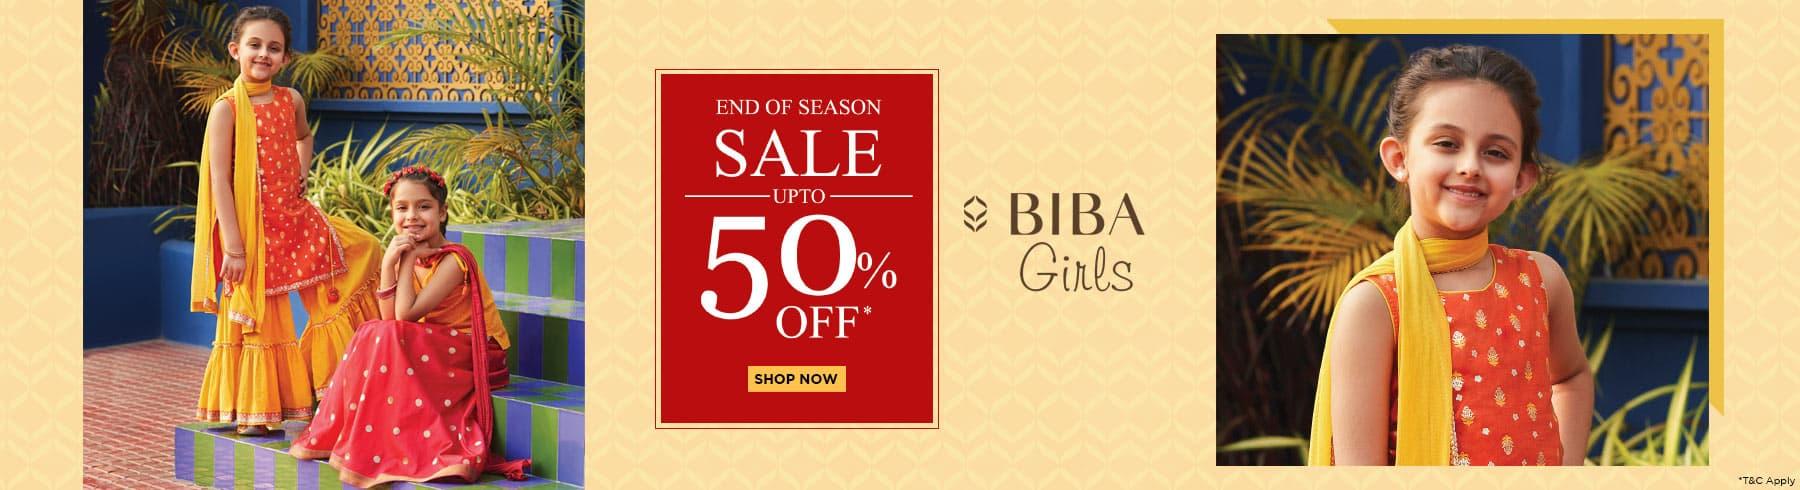 biba.in - Avail Flat 50% OFF on Biba Girls Ethnic